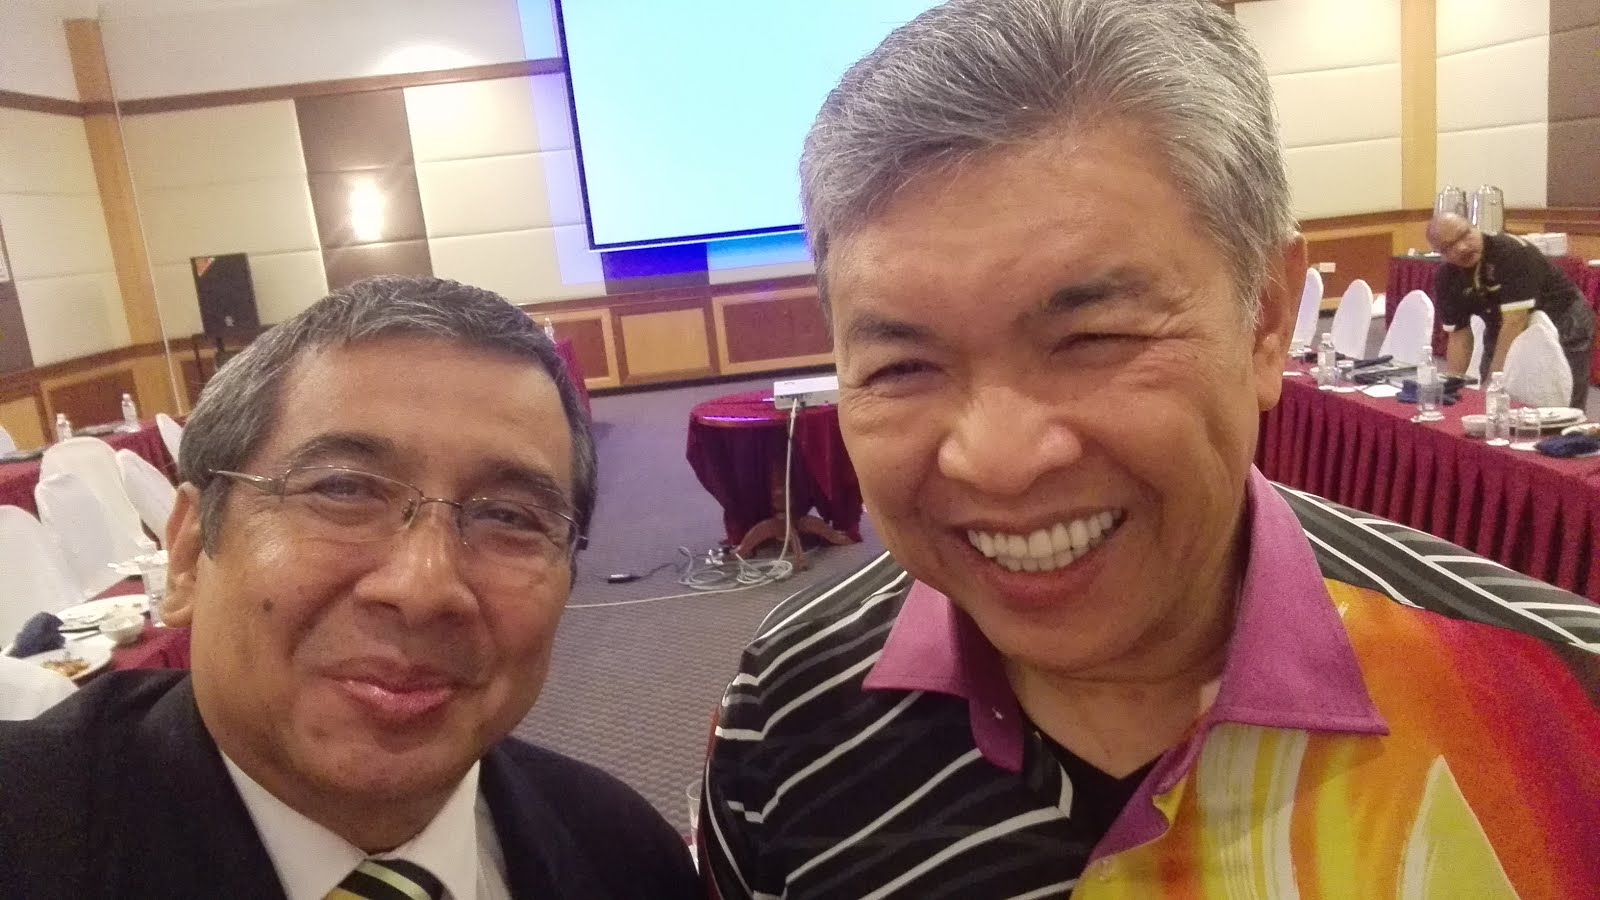 YB Dato Seri Dr Hj Ahmad Zahid Hamidi